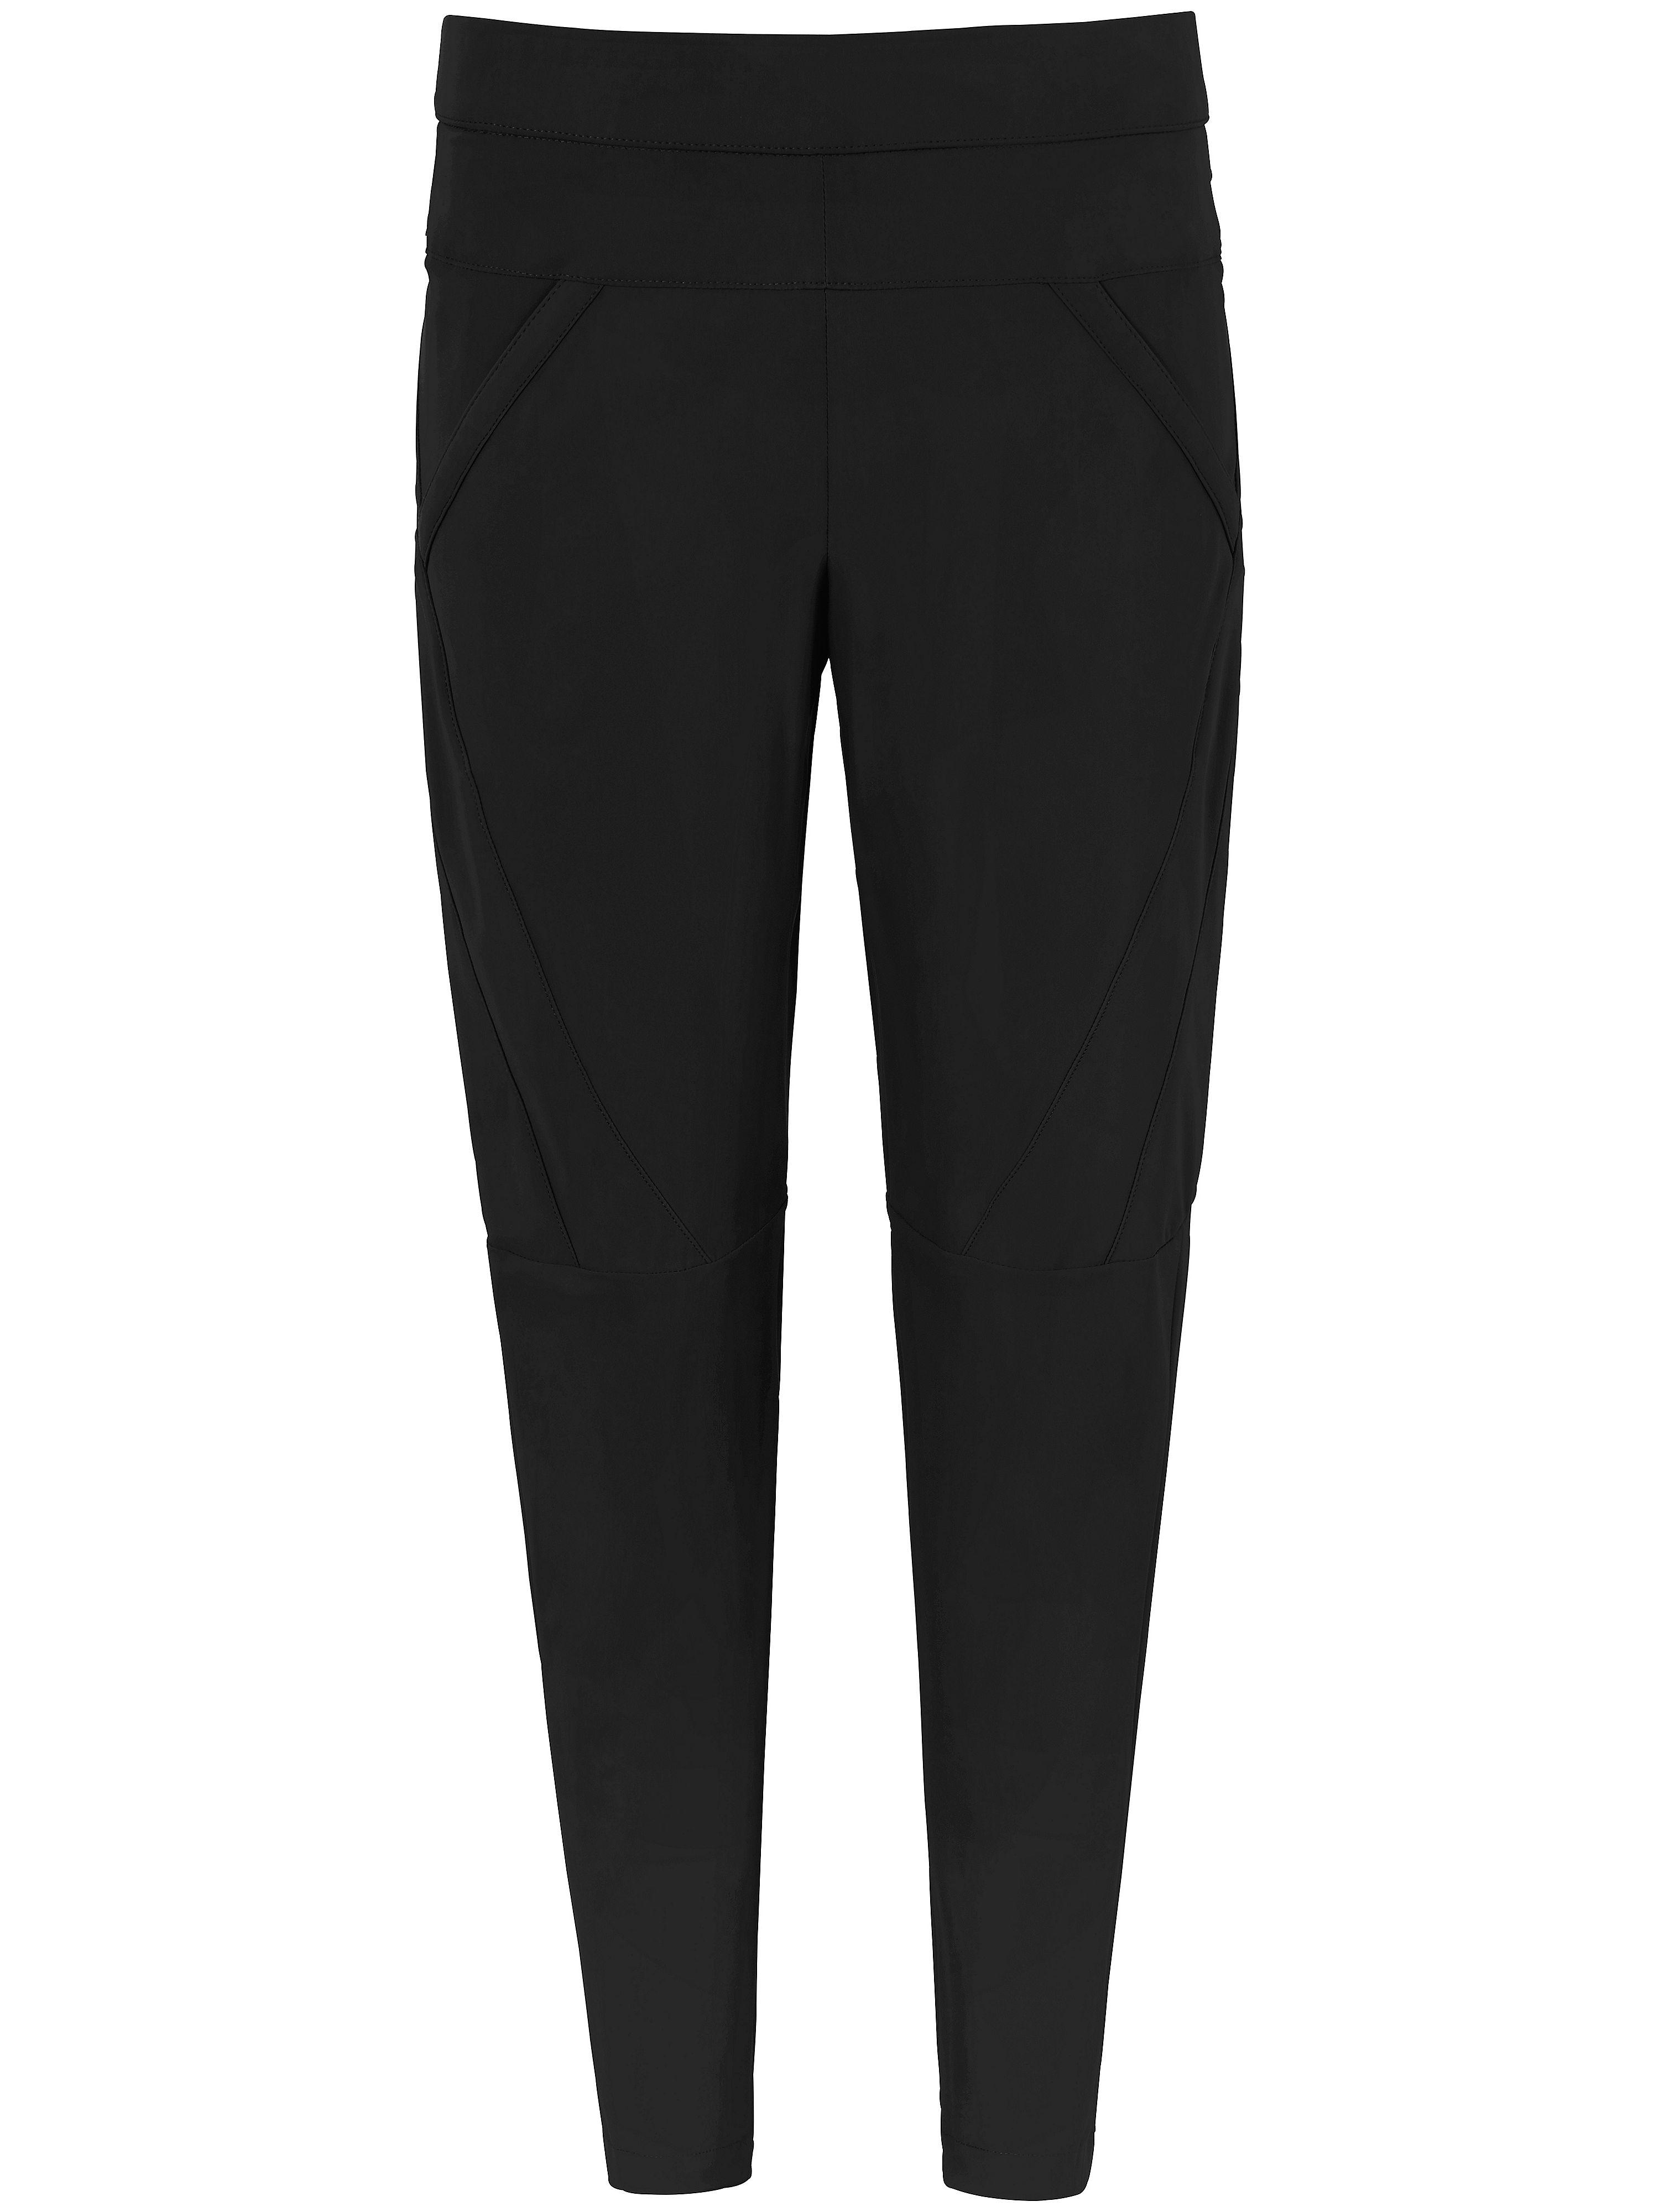 Le pantalon 7/8  Raffaello Rossi noir taille 42